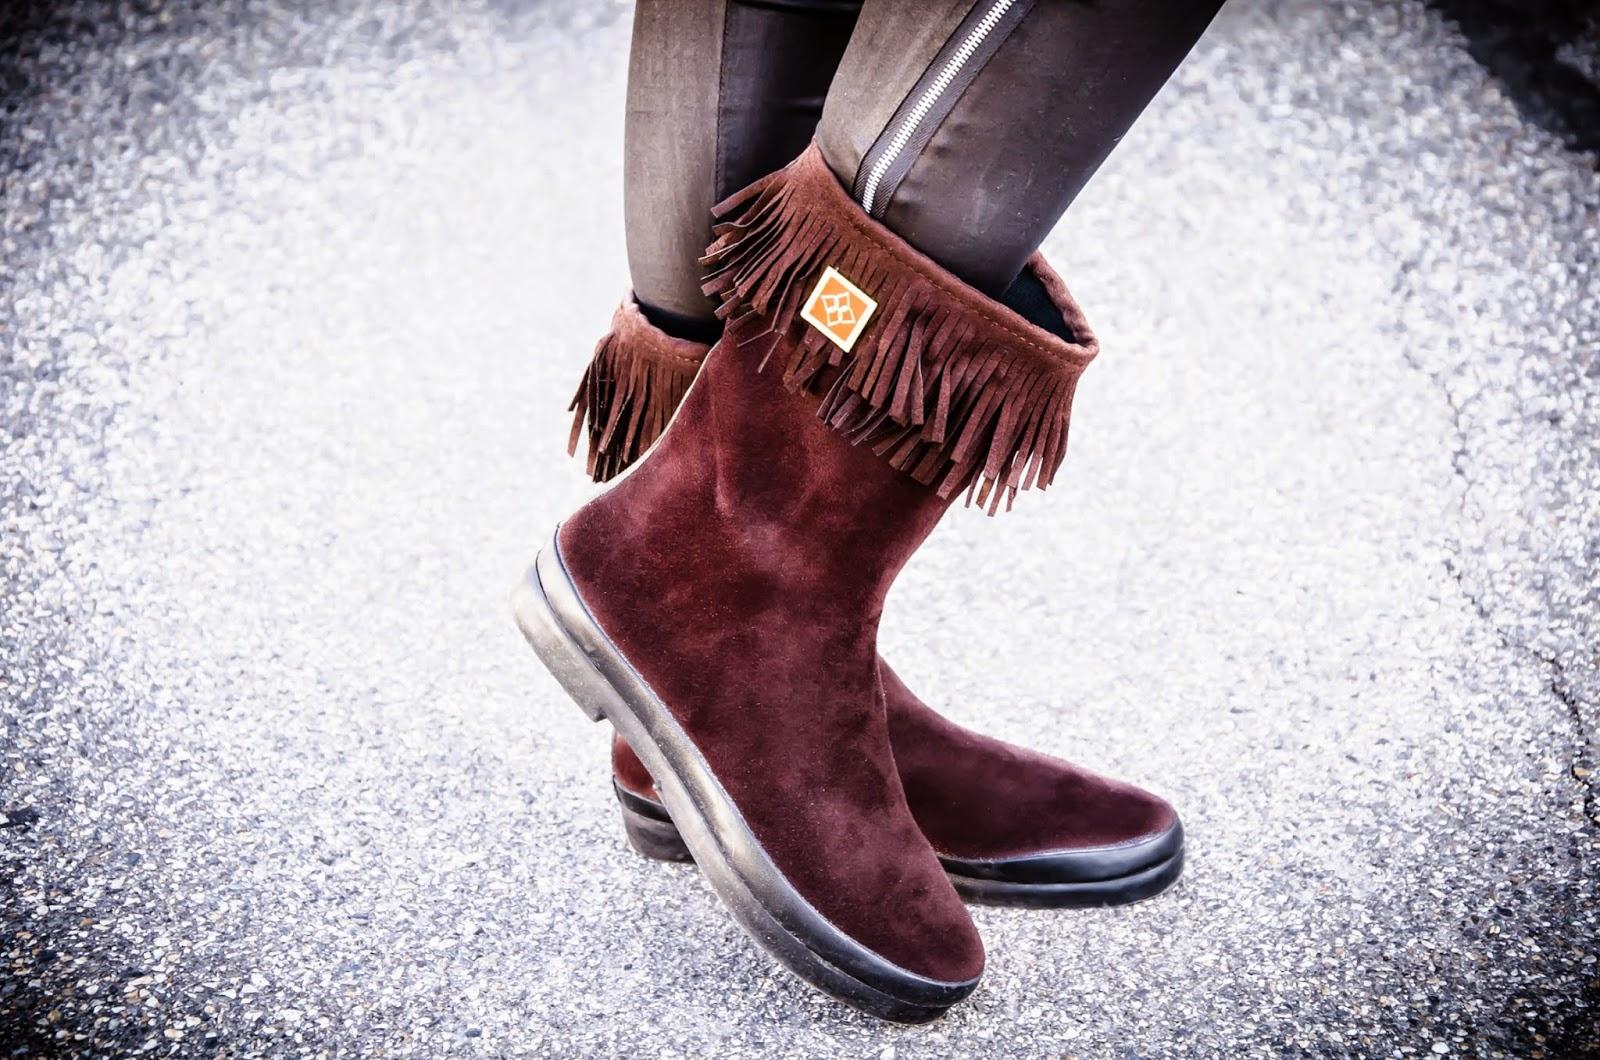 dav boots, Däv Sydney Mid Boots, Däv boots, brown boots, fringe boots, boots review, dav review, Däv review, cute, love,